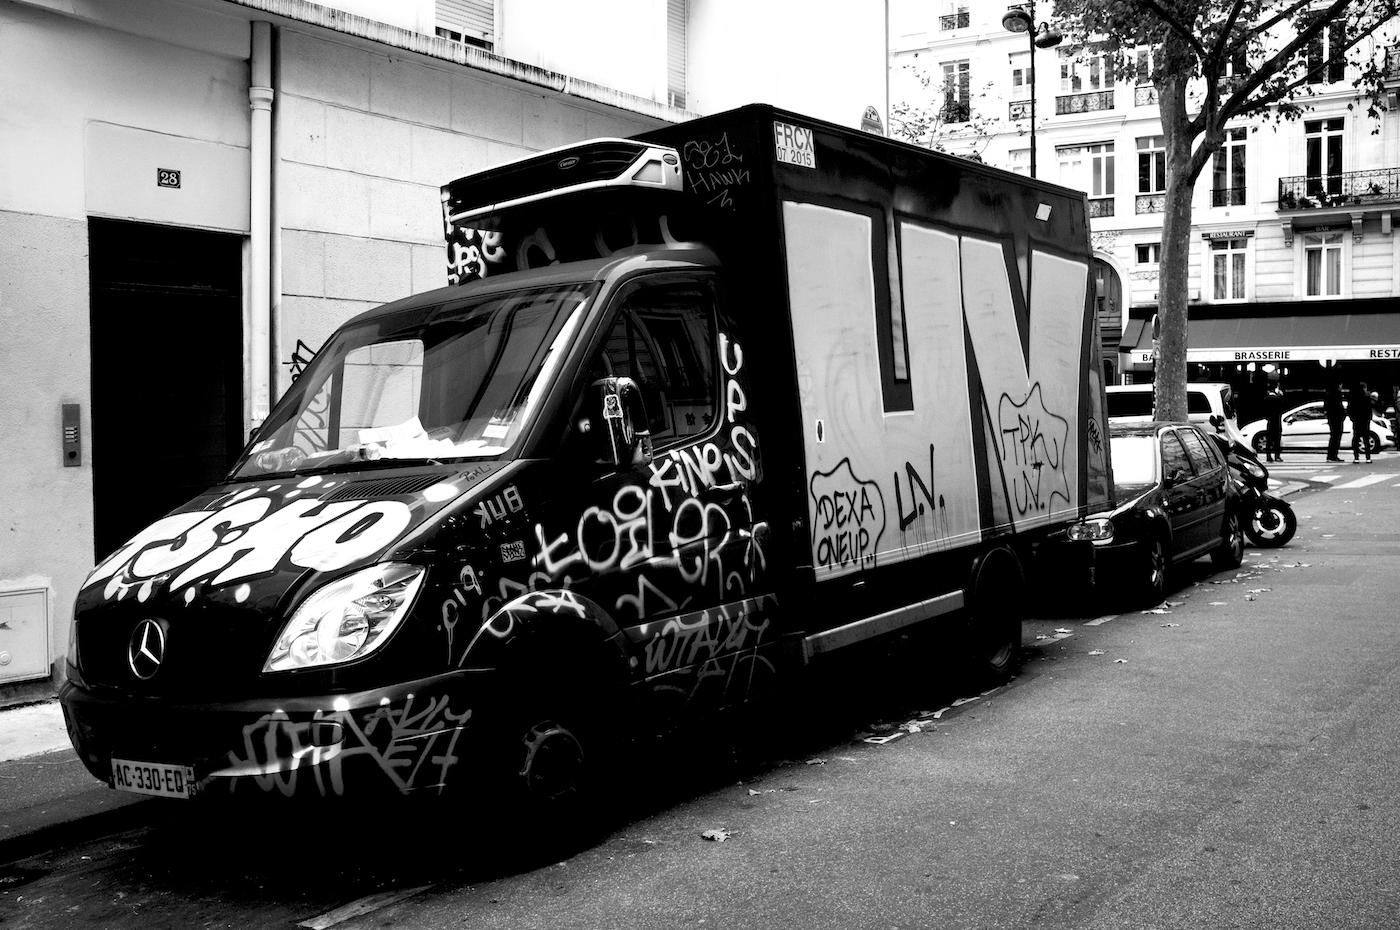 161126-marcvallee-Graffiti-Trucks-26.11.16.0057